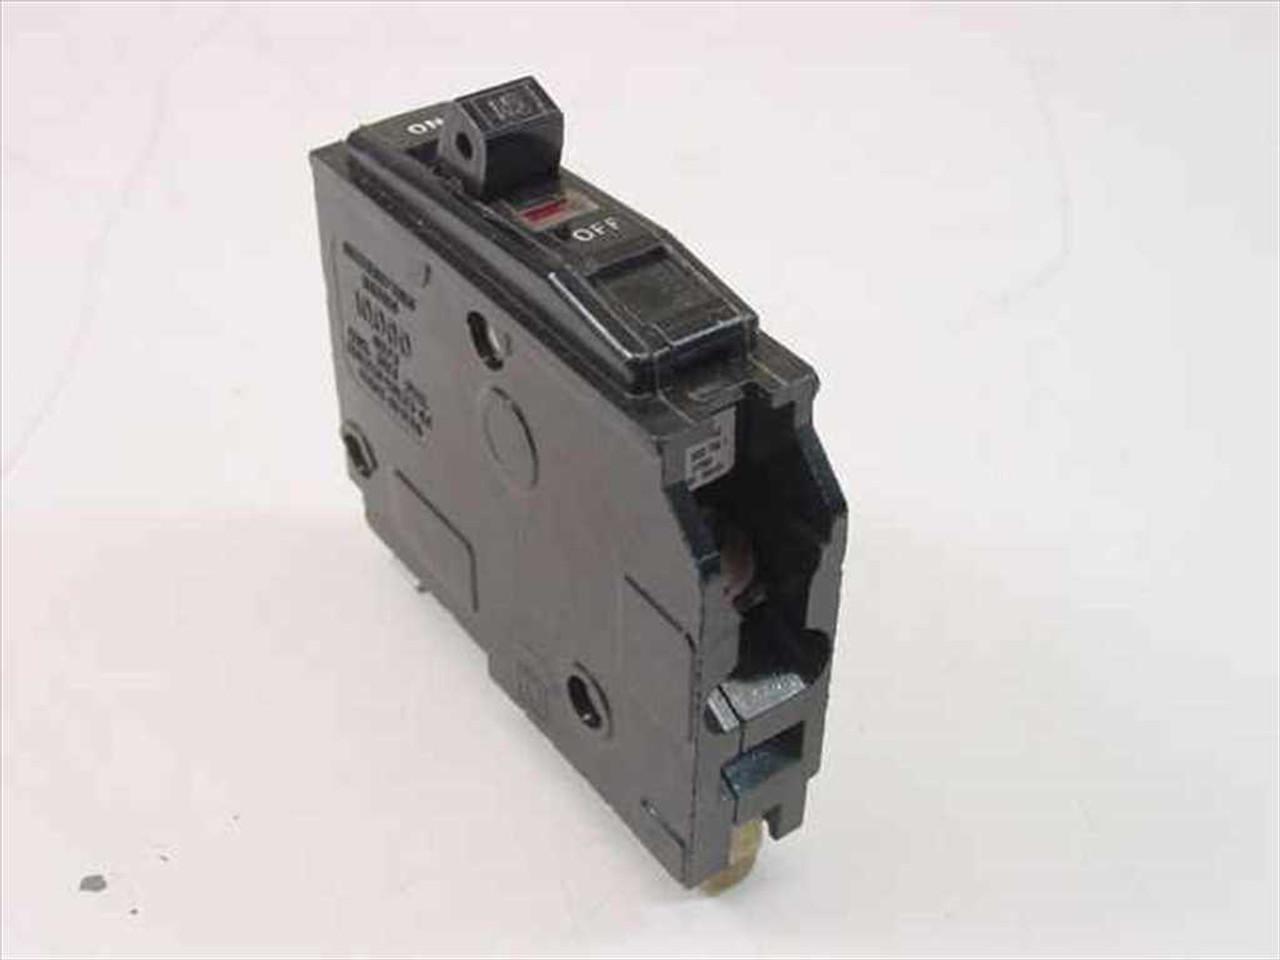 Square D LD-841 Type 00 1 Pole 15 Amp Circuit Breaker ...